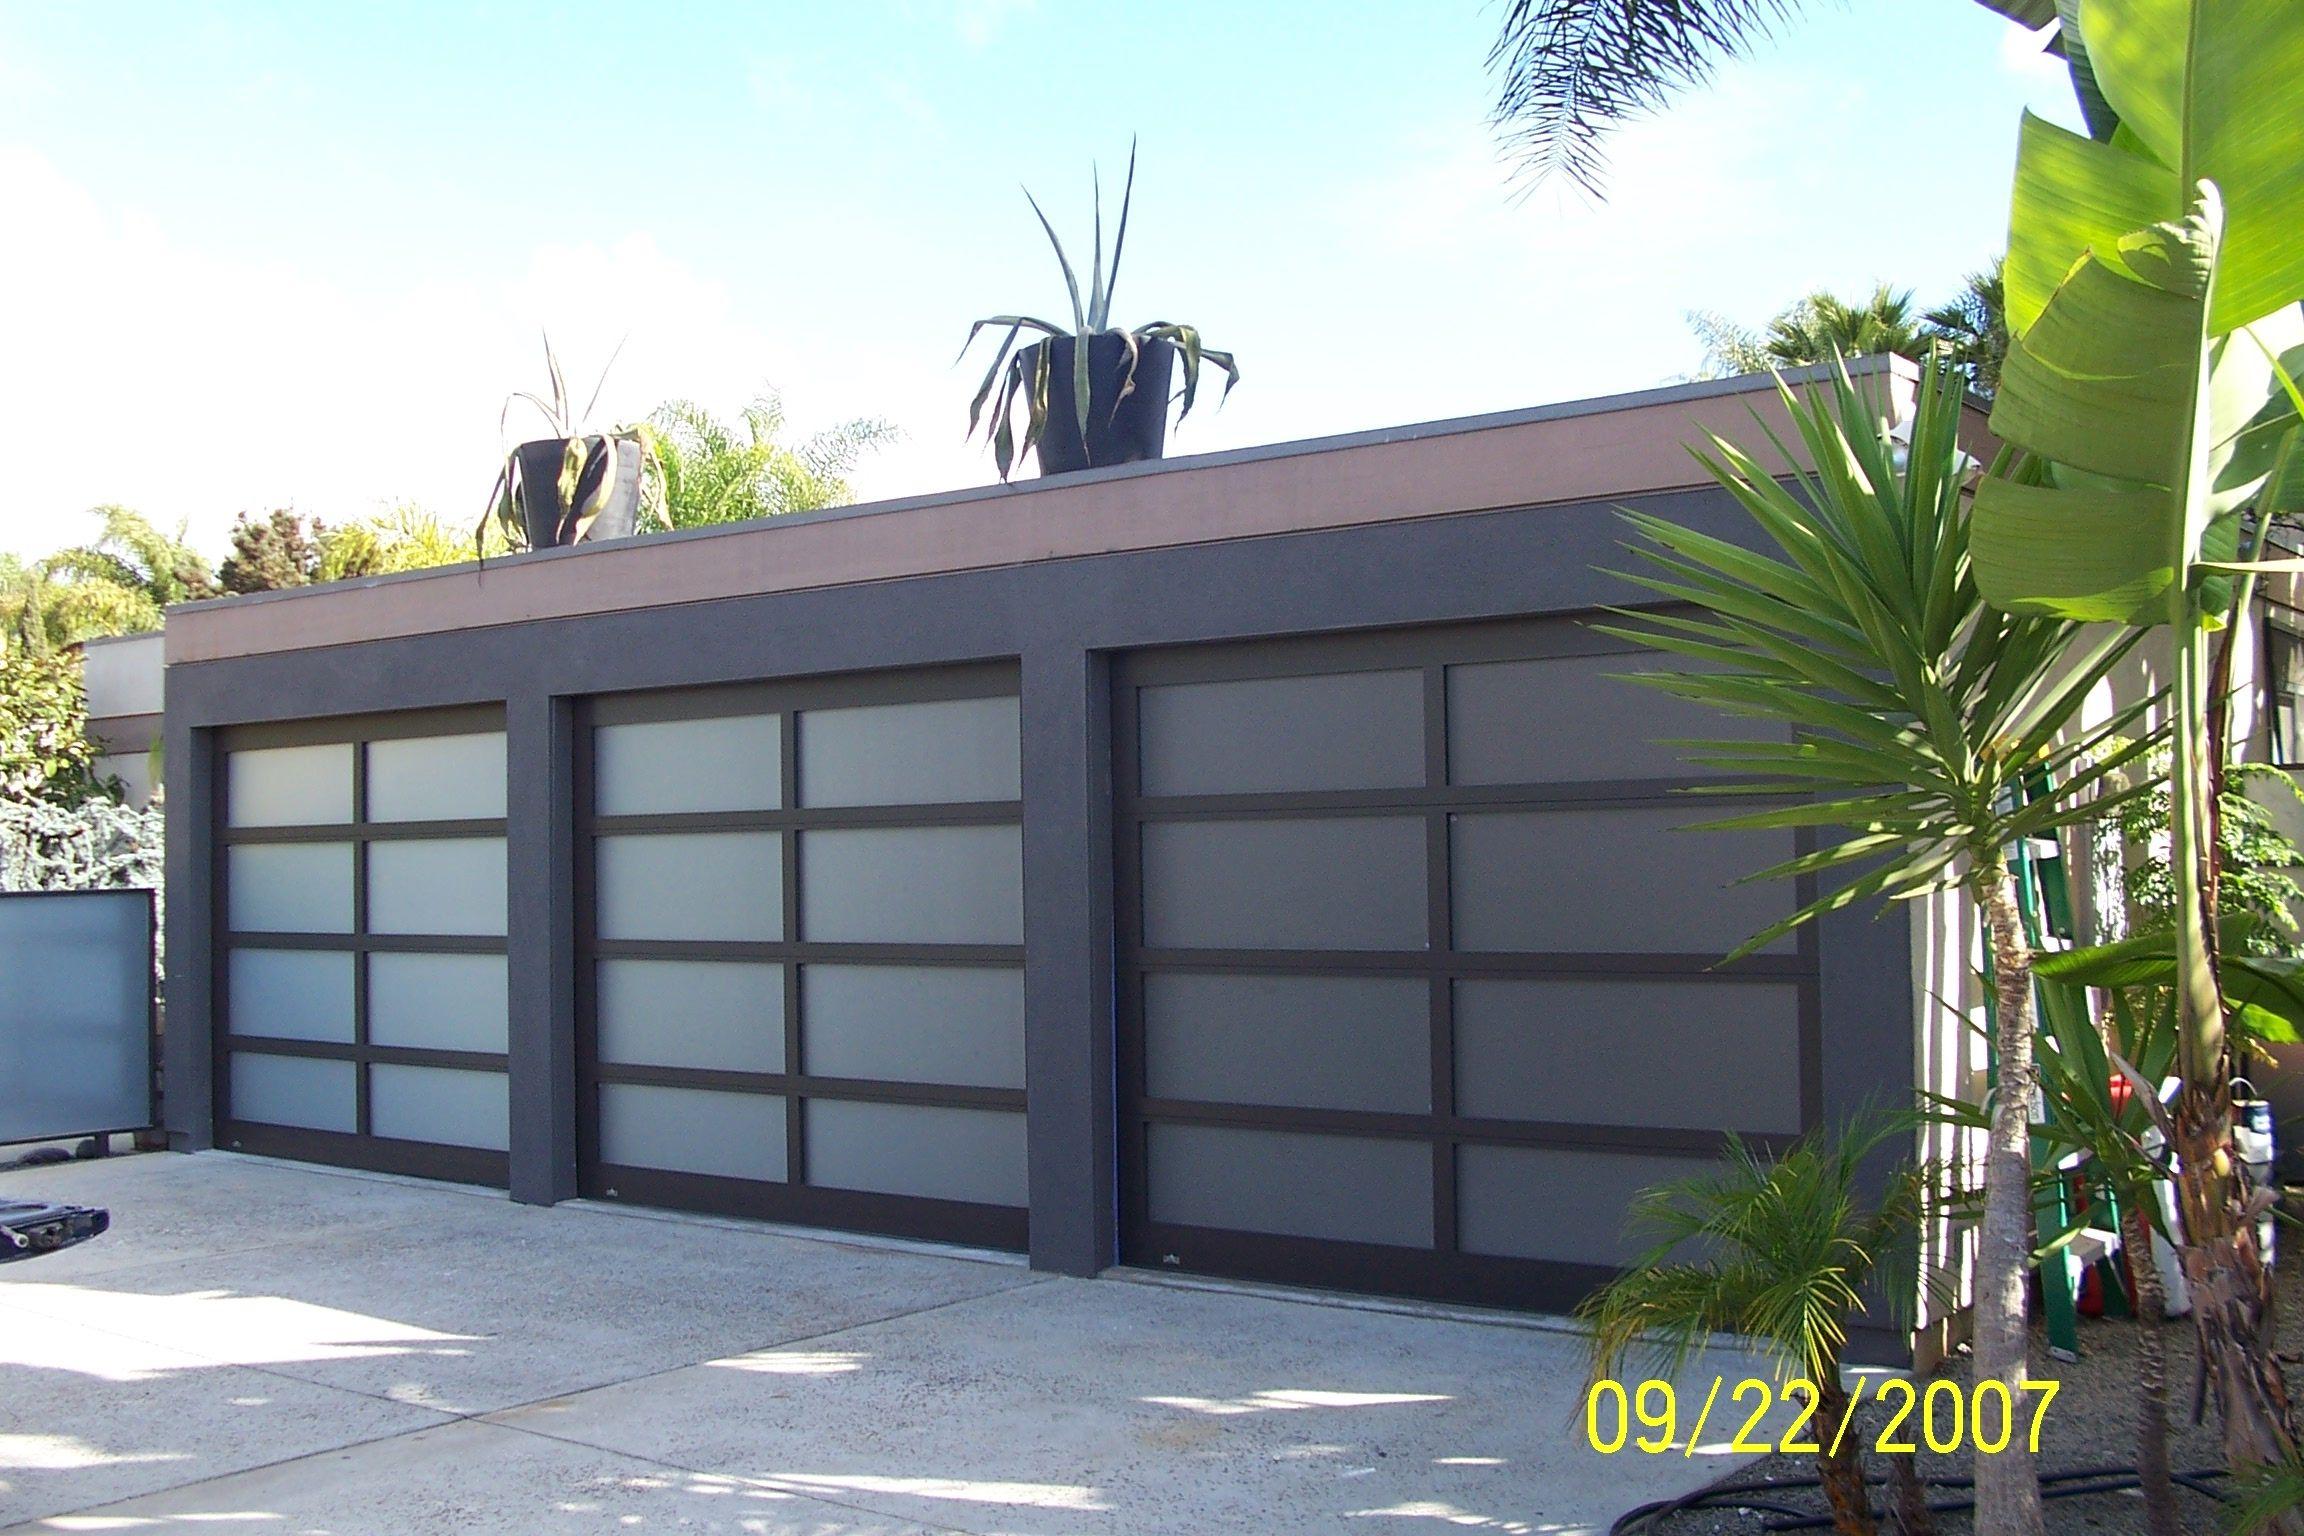 strut door ideas pinnacle overhead styles of inspiring and repair co aflk garage metal adjustable uncategorized martin